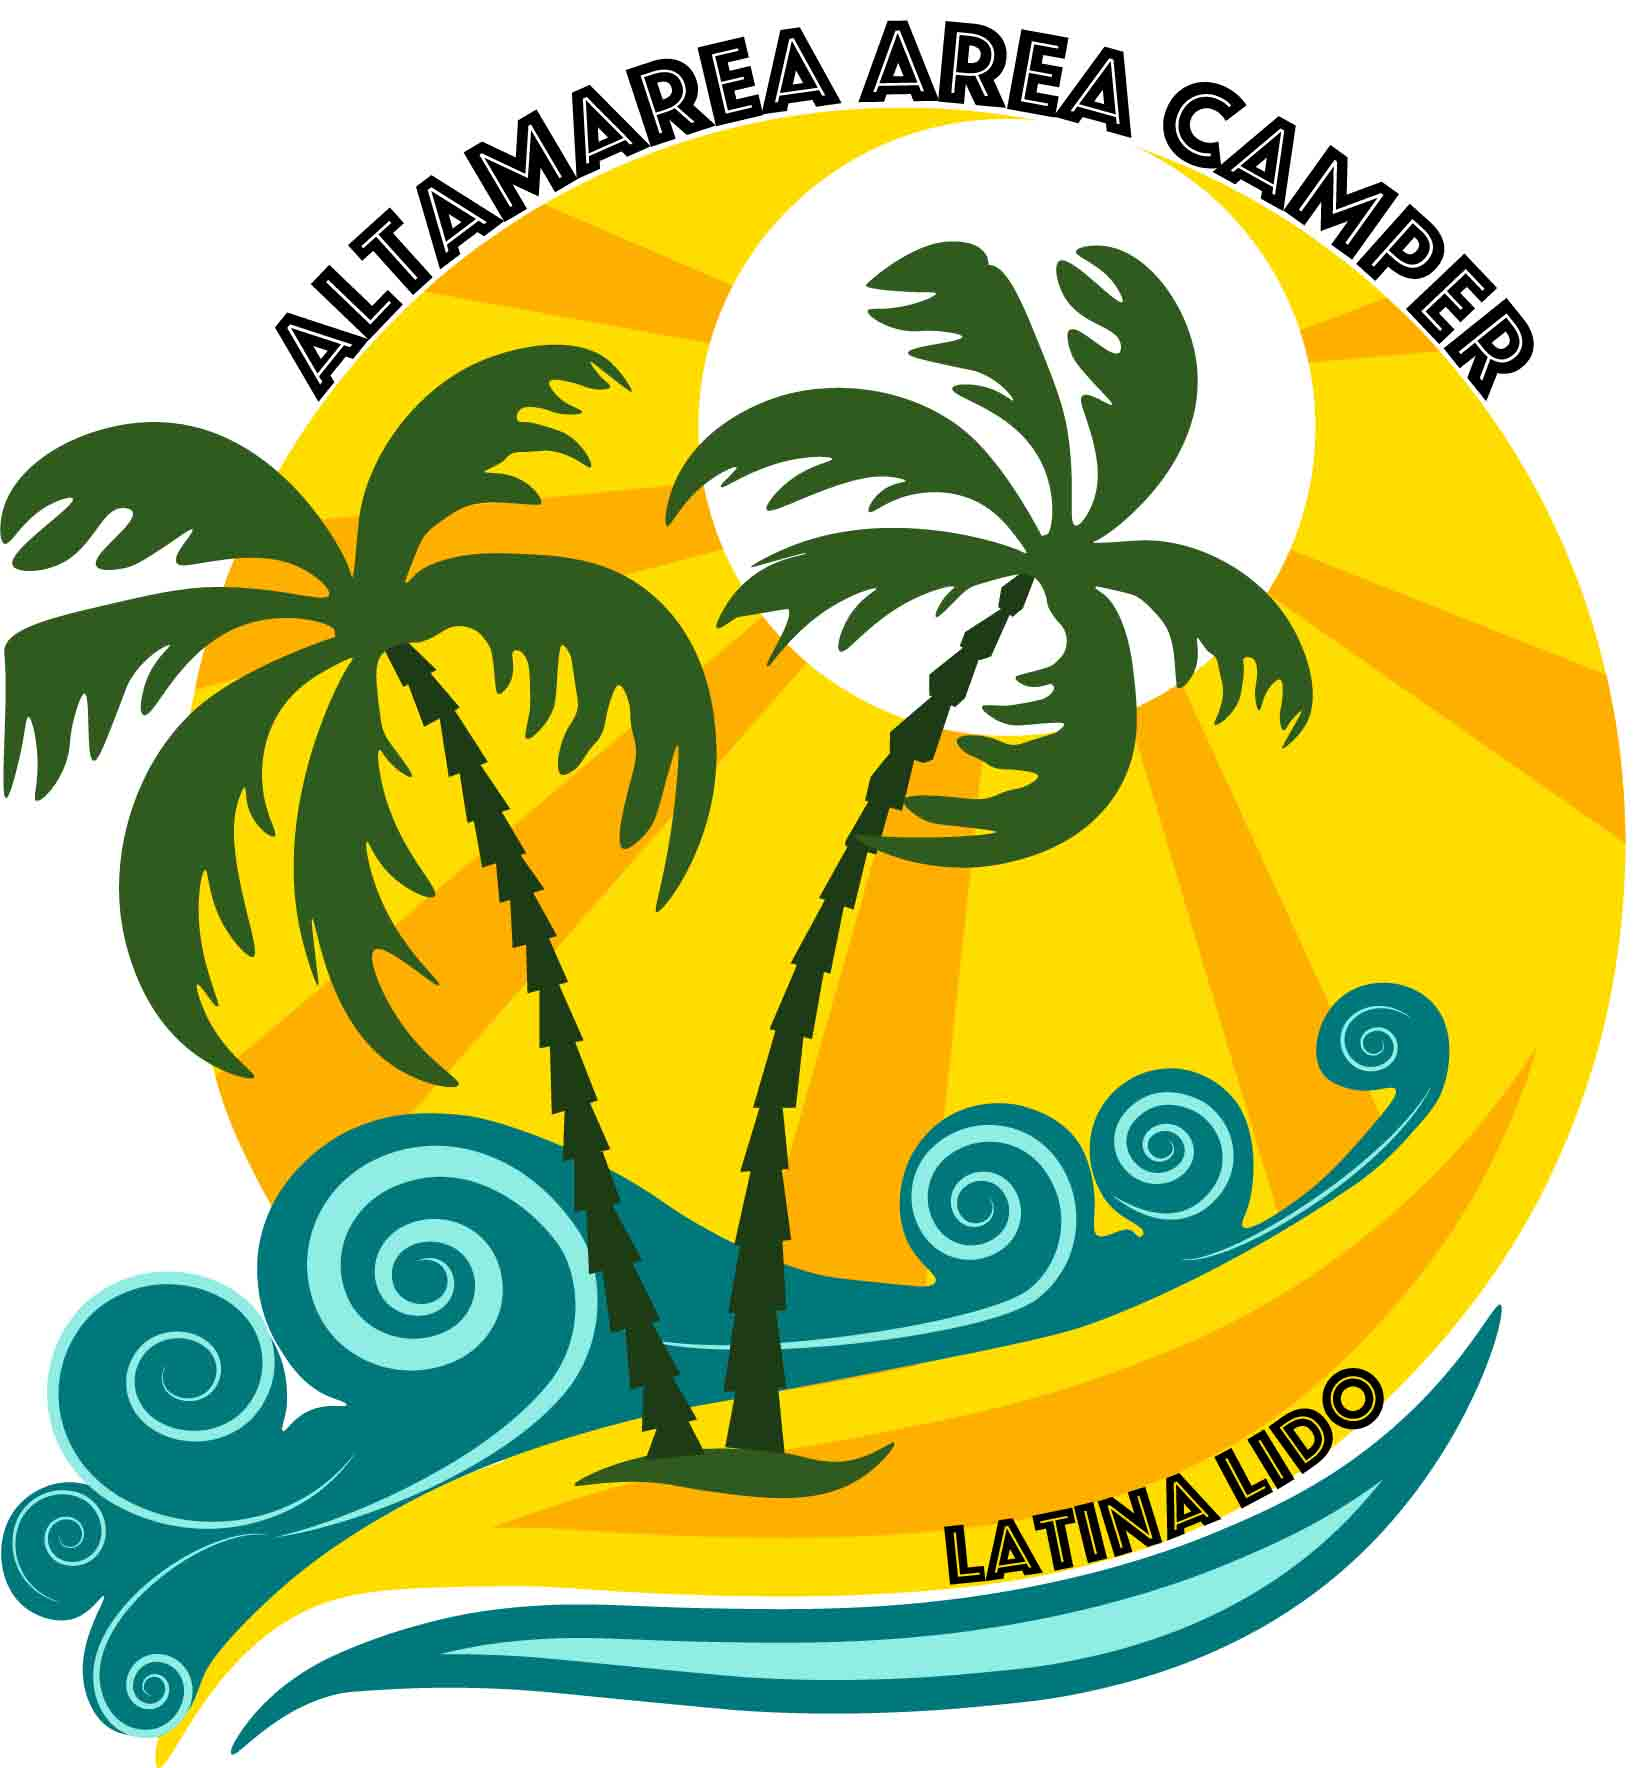 Logo altamarea area camper